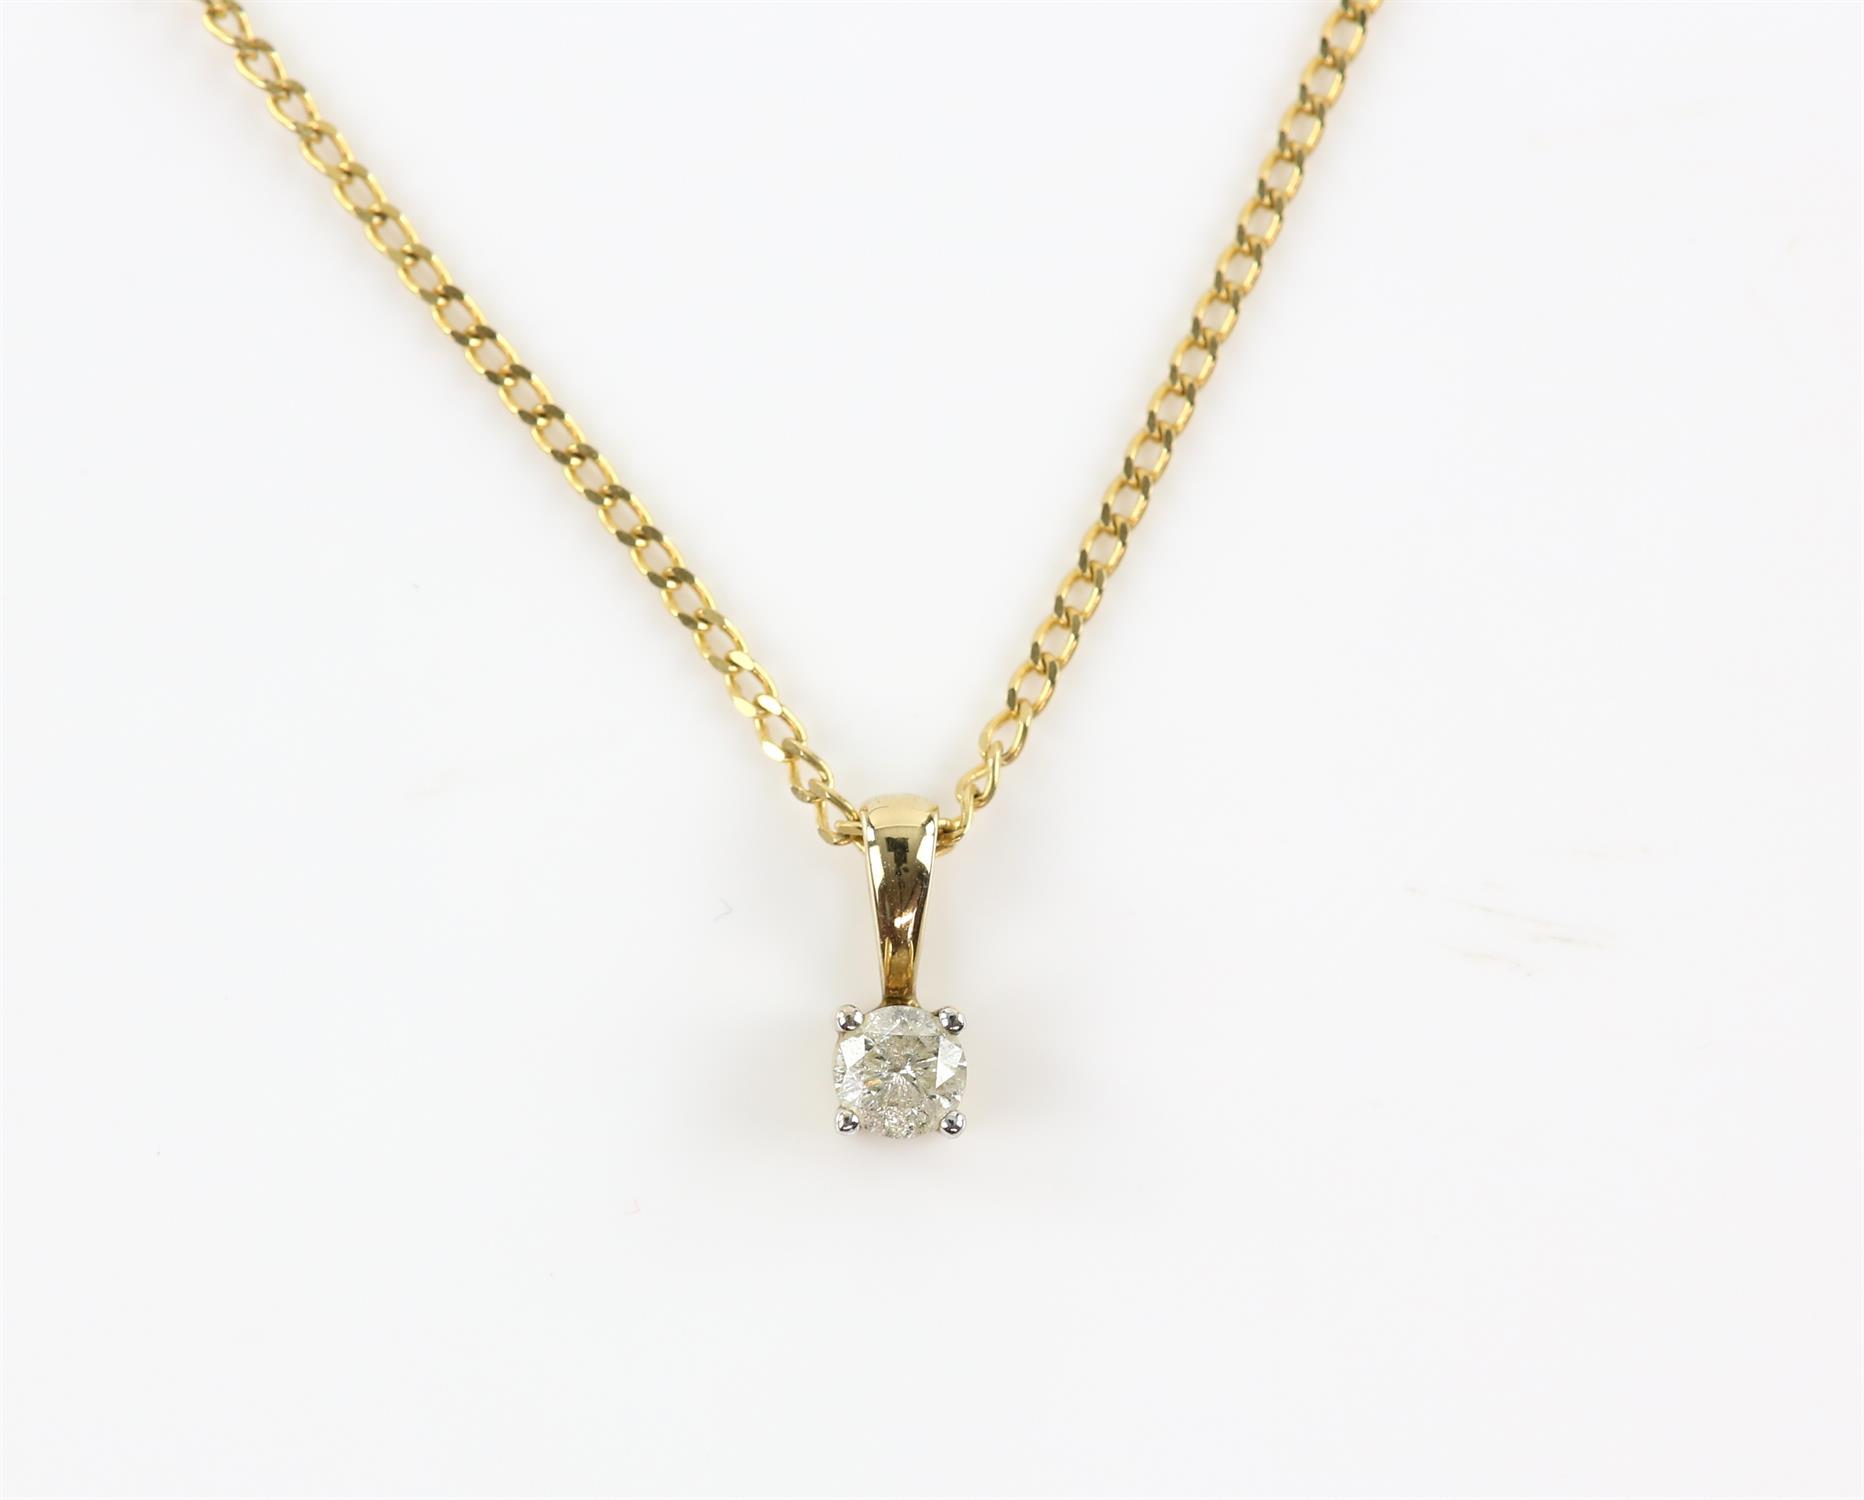 Single stone diamond pendant, round brilliant cut diamond weighing an estimated 0.23 carat,